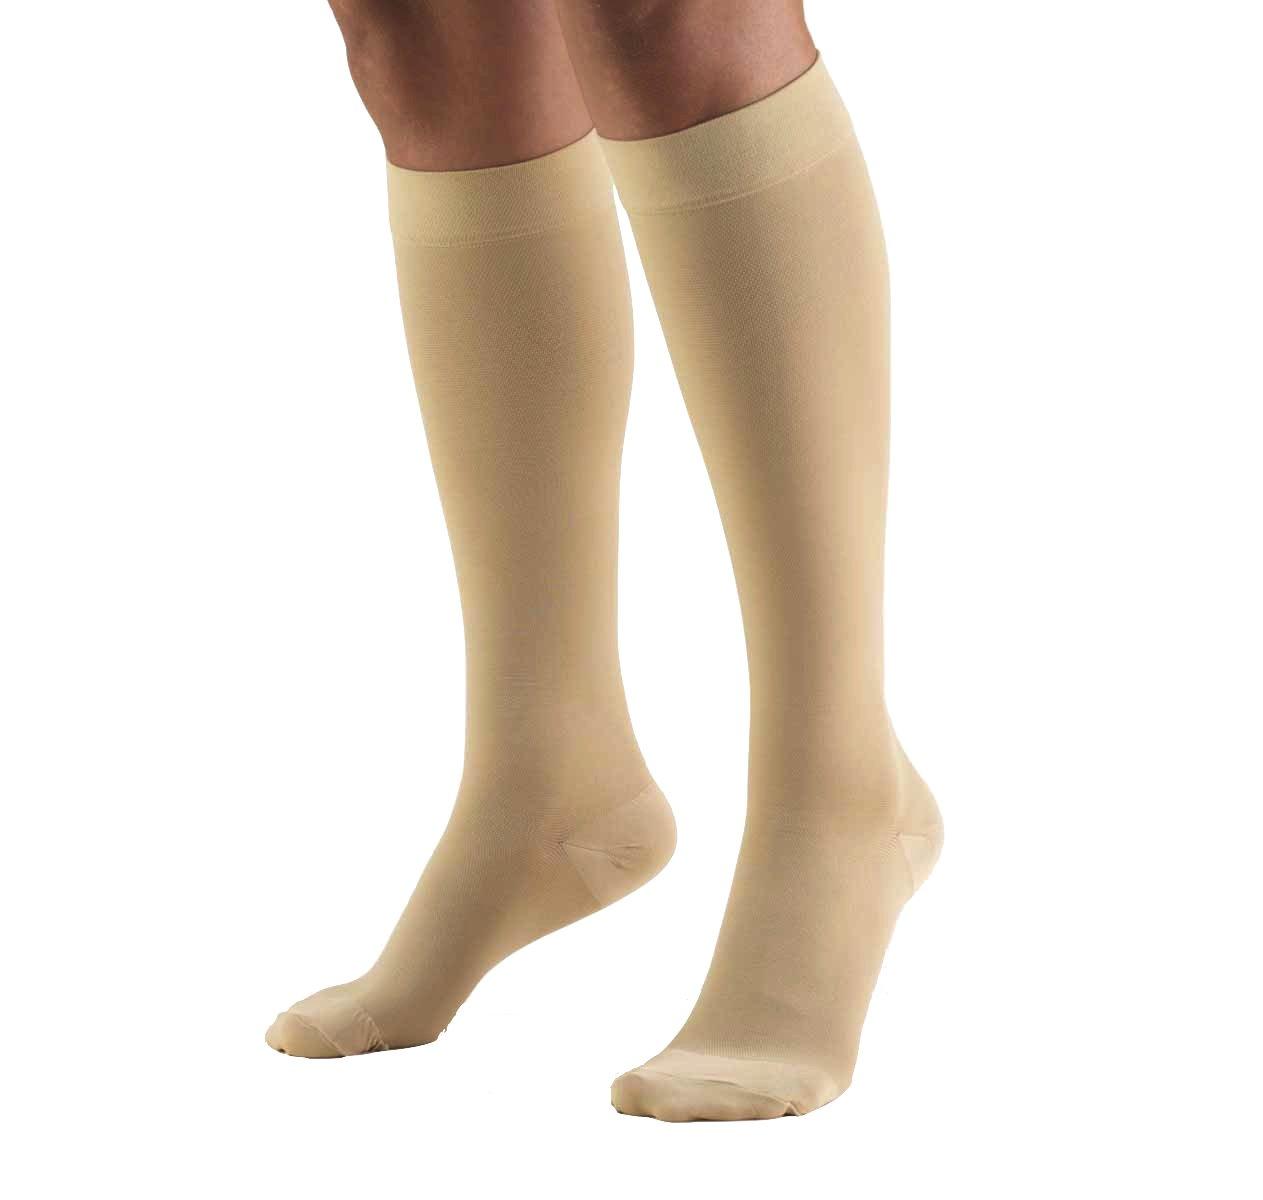 a7deb6b72 Amazon.com  JOBST Relief 30-40 mmHg Compression Socks